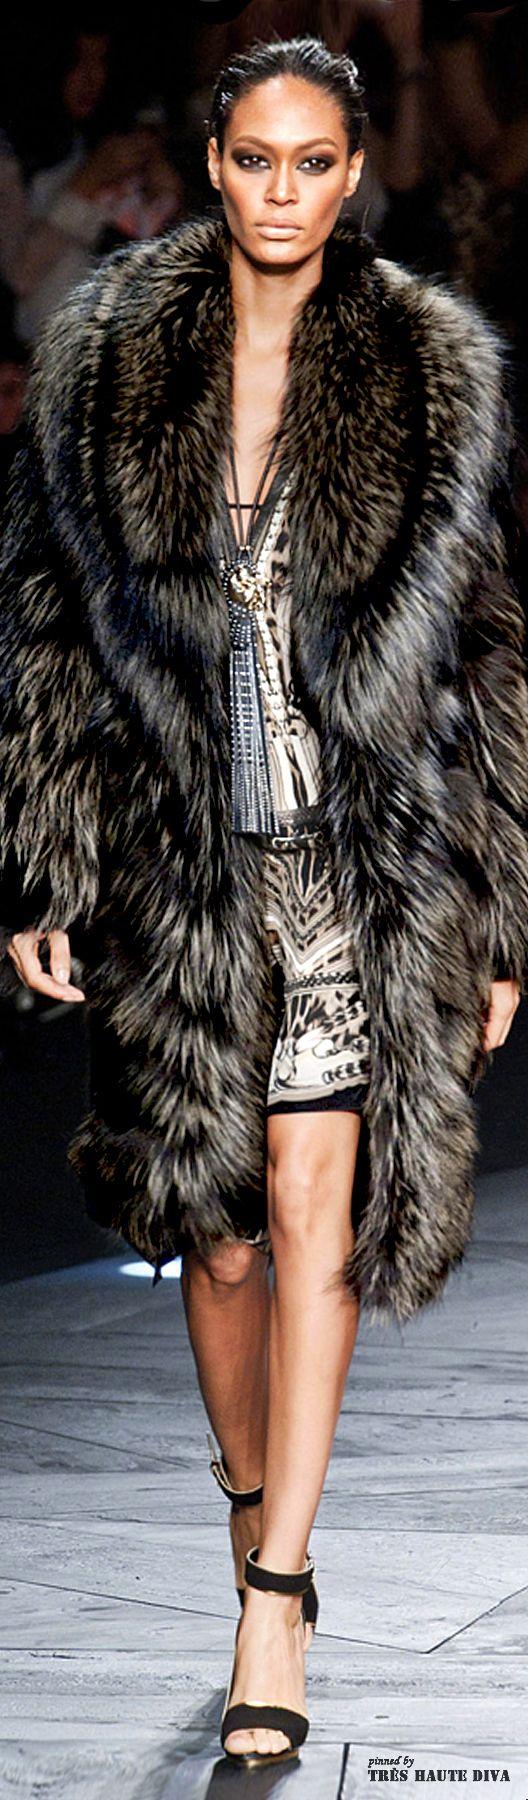 Roberto Cavalli Fall/Winter 2014 | Furs everywhere bykoket.com/home.php